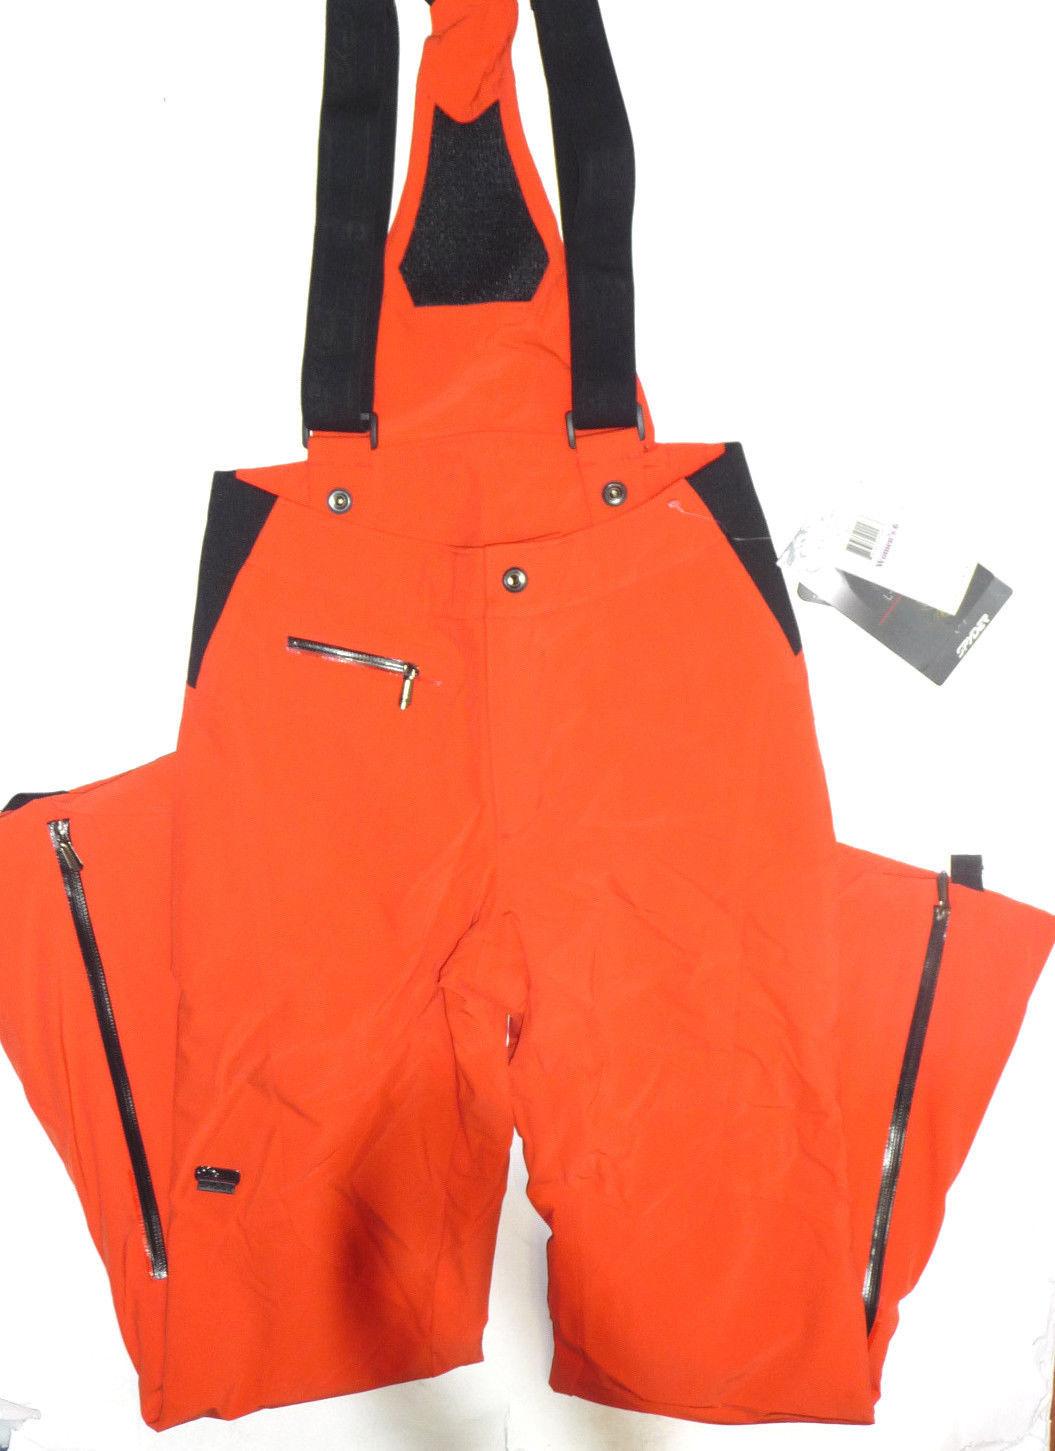 Spyder Ruby Pants Womens Ski Snowboard 20k Waterproof Insulated Orange 6 $400